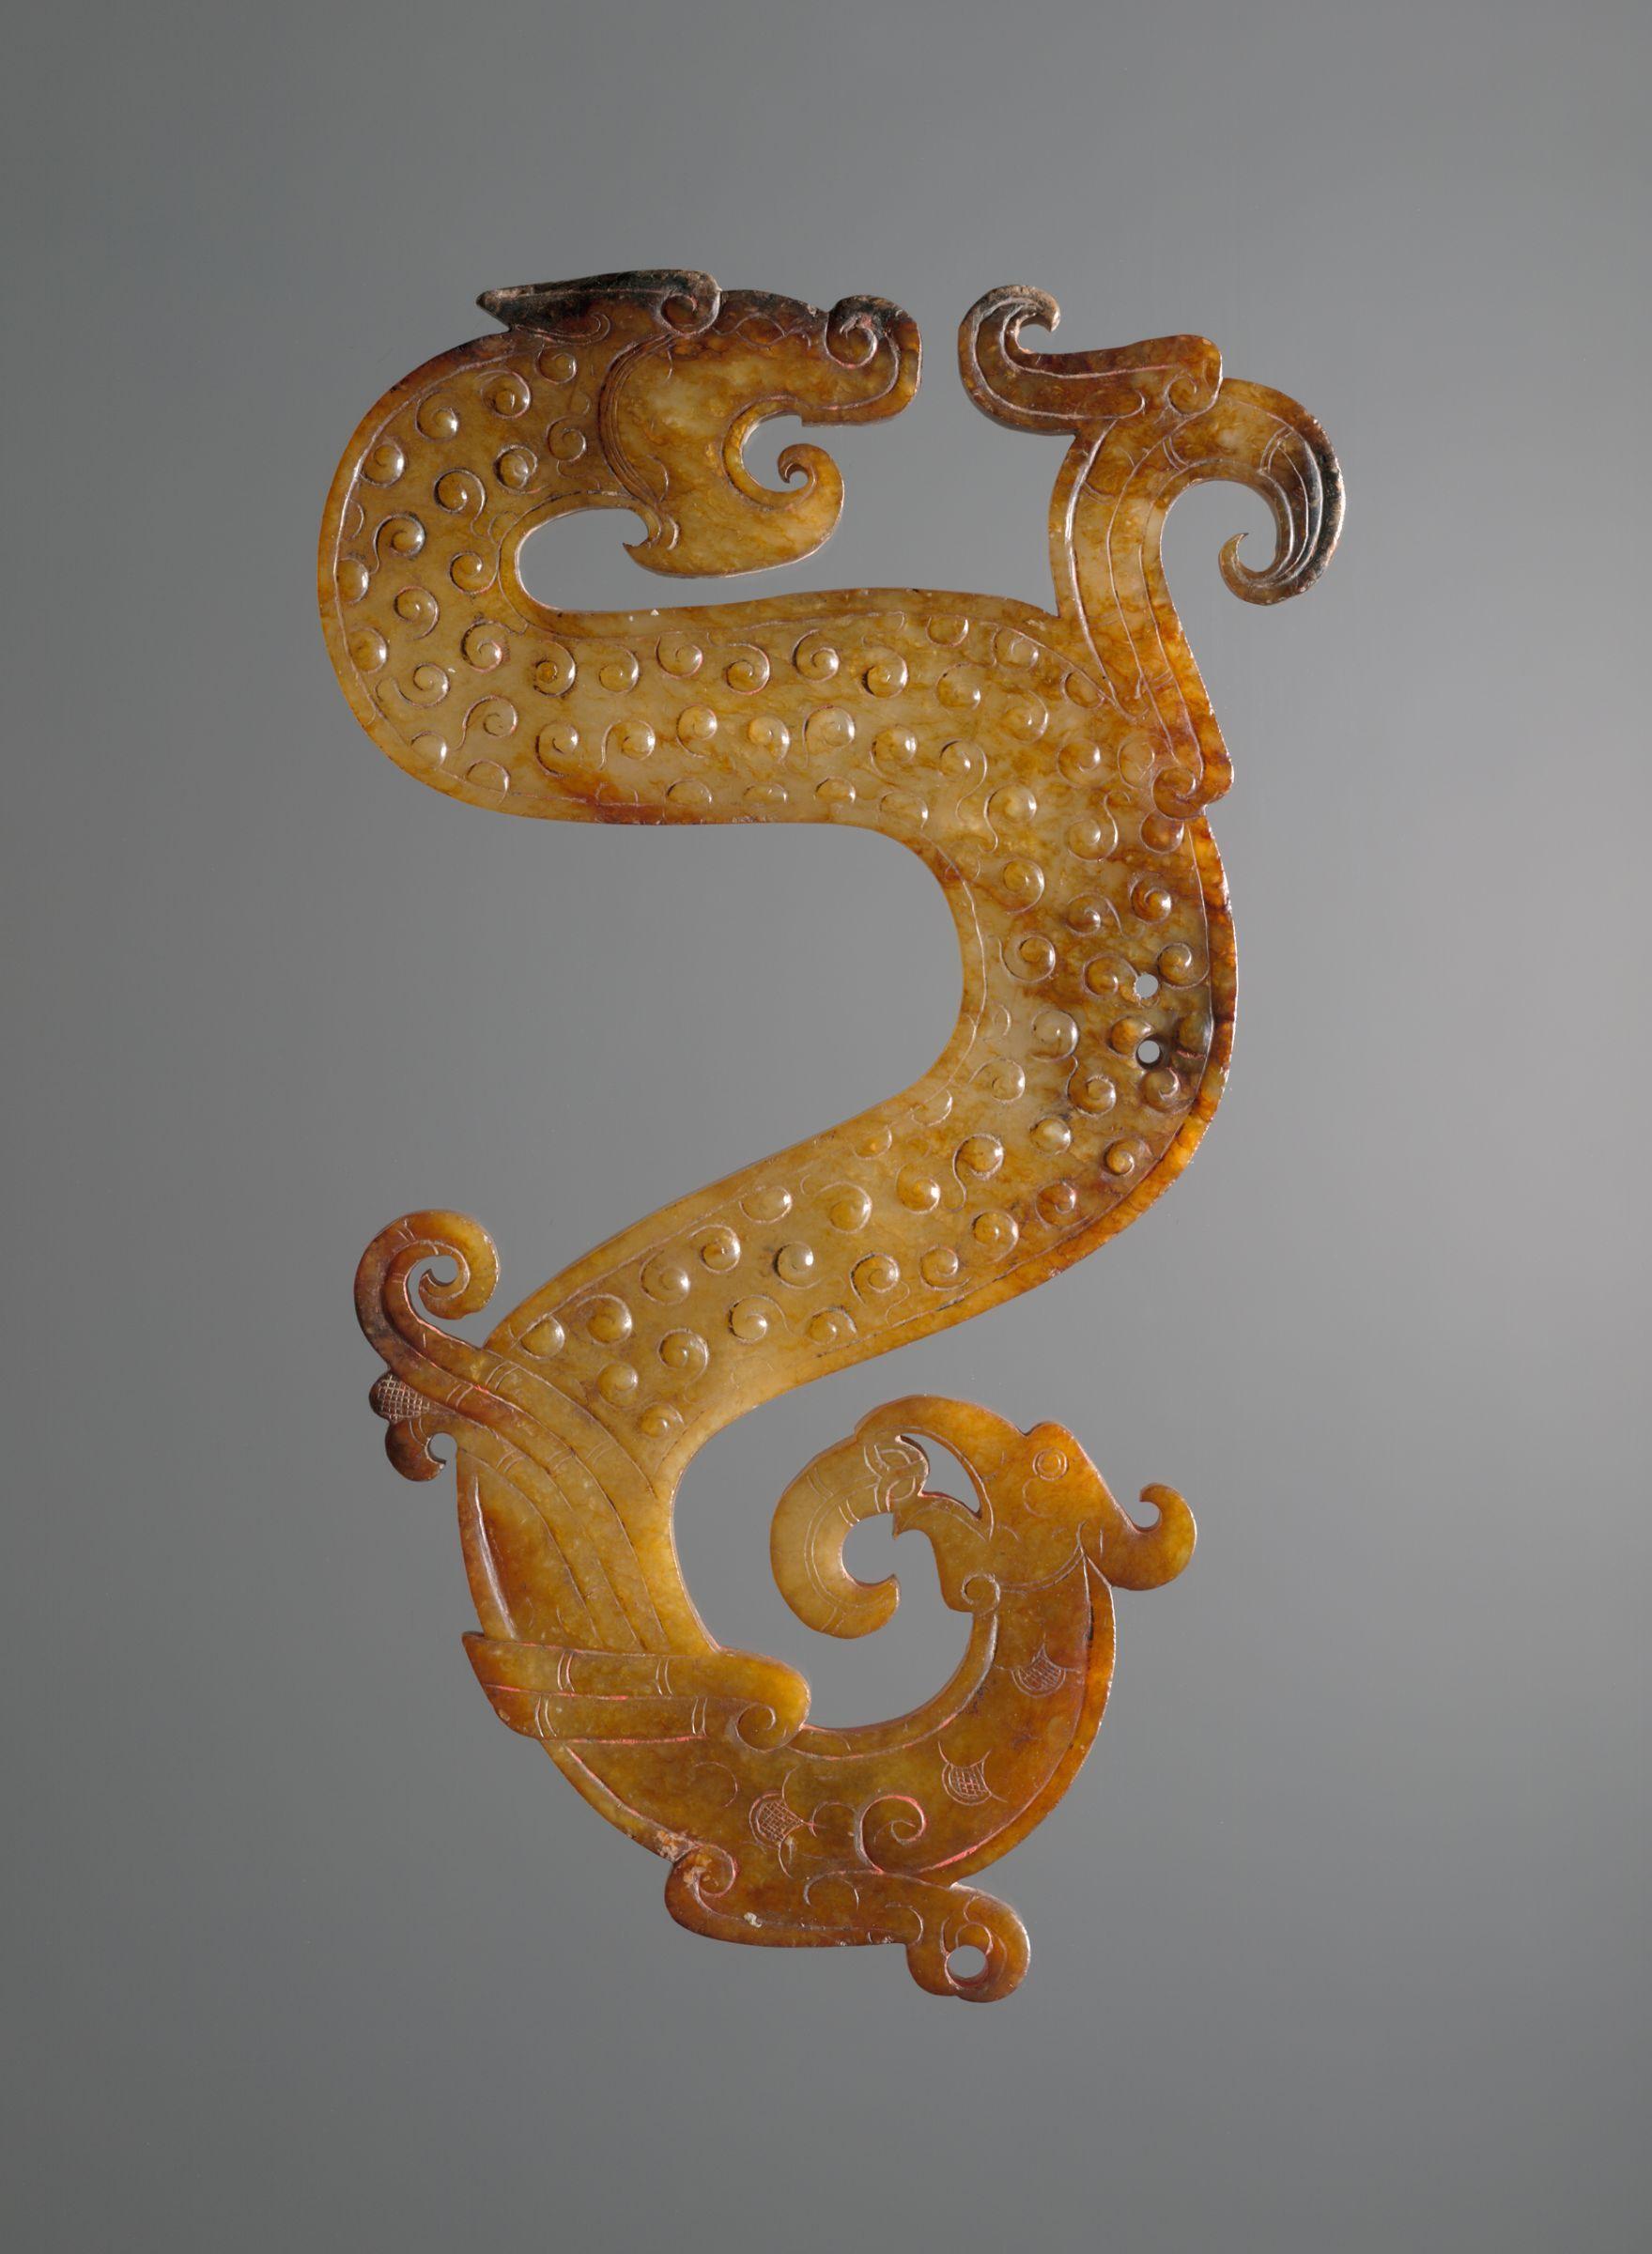 Jade configuration of dragon bird and snake 4th 3rd century bc jade configuration of dragon bird snake v iii bc zhou dynasty warring states period bc china buycottarizona Choice Image